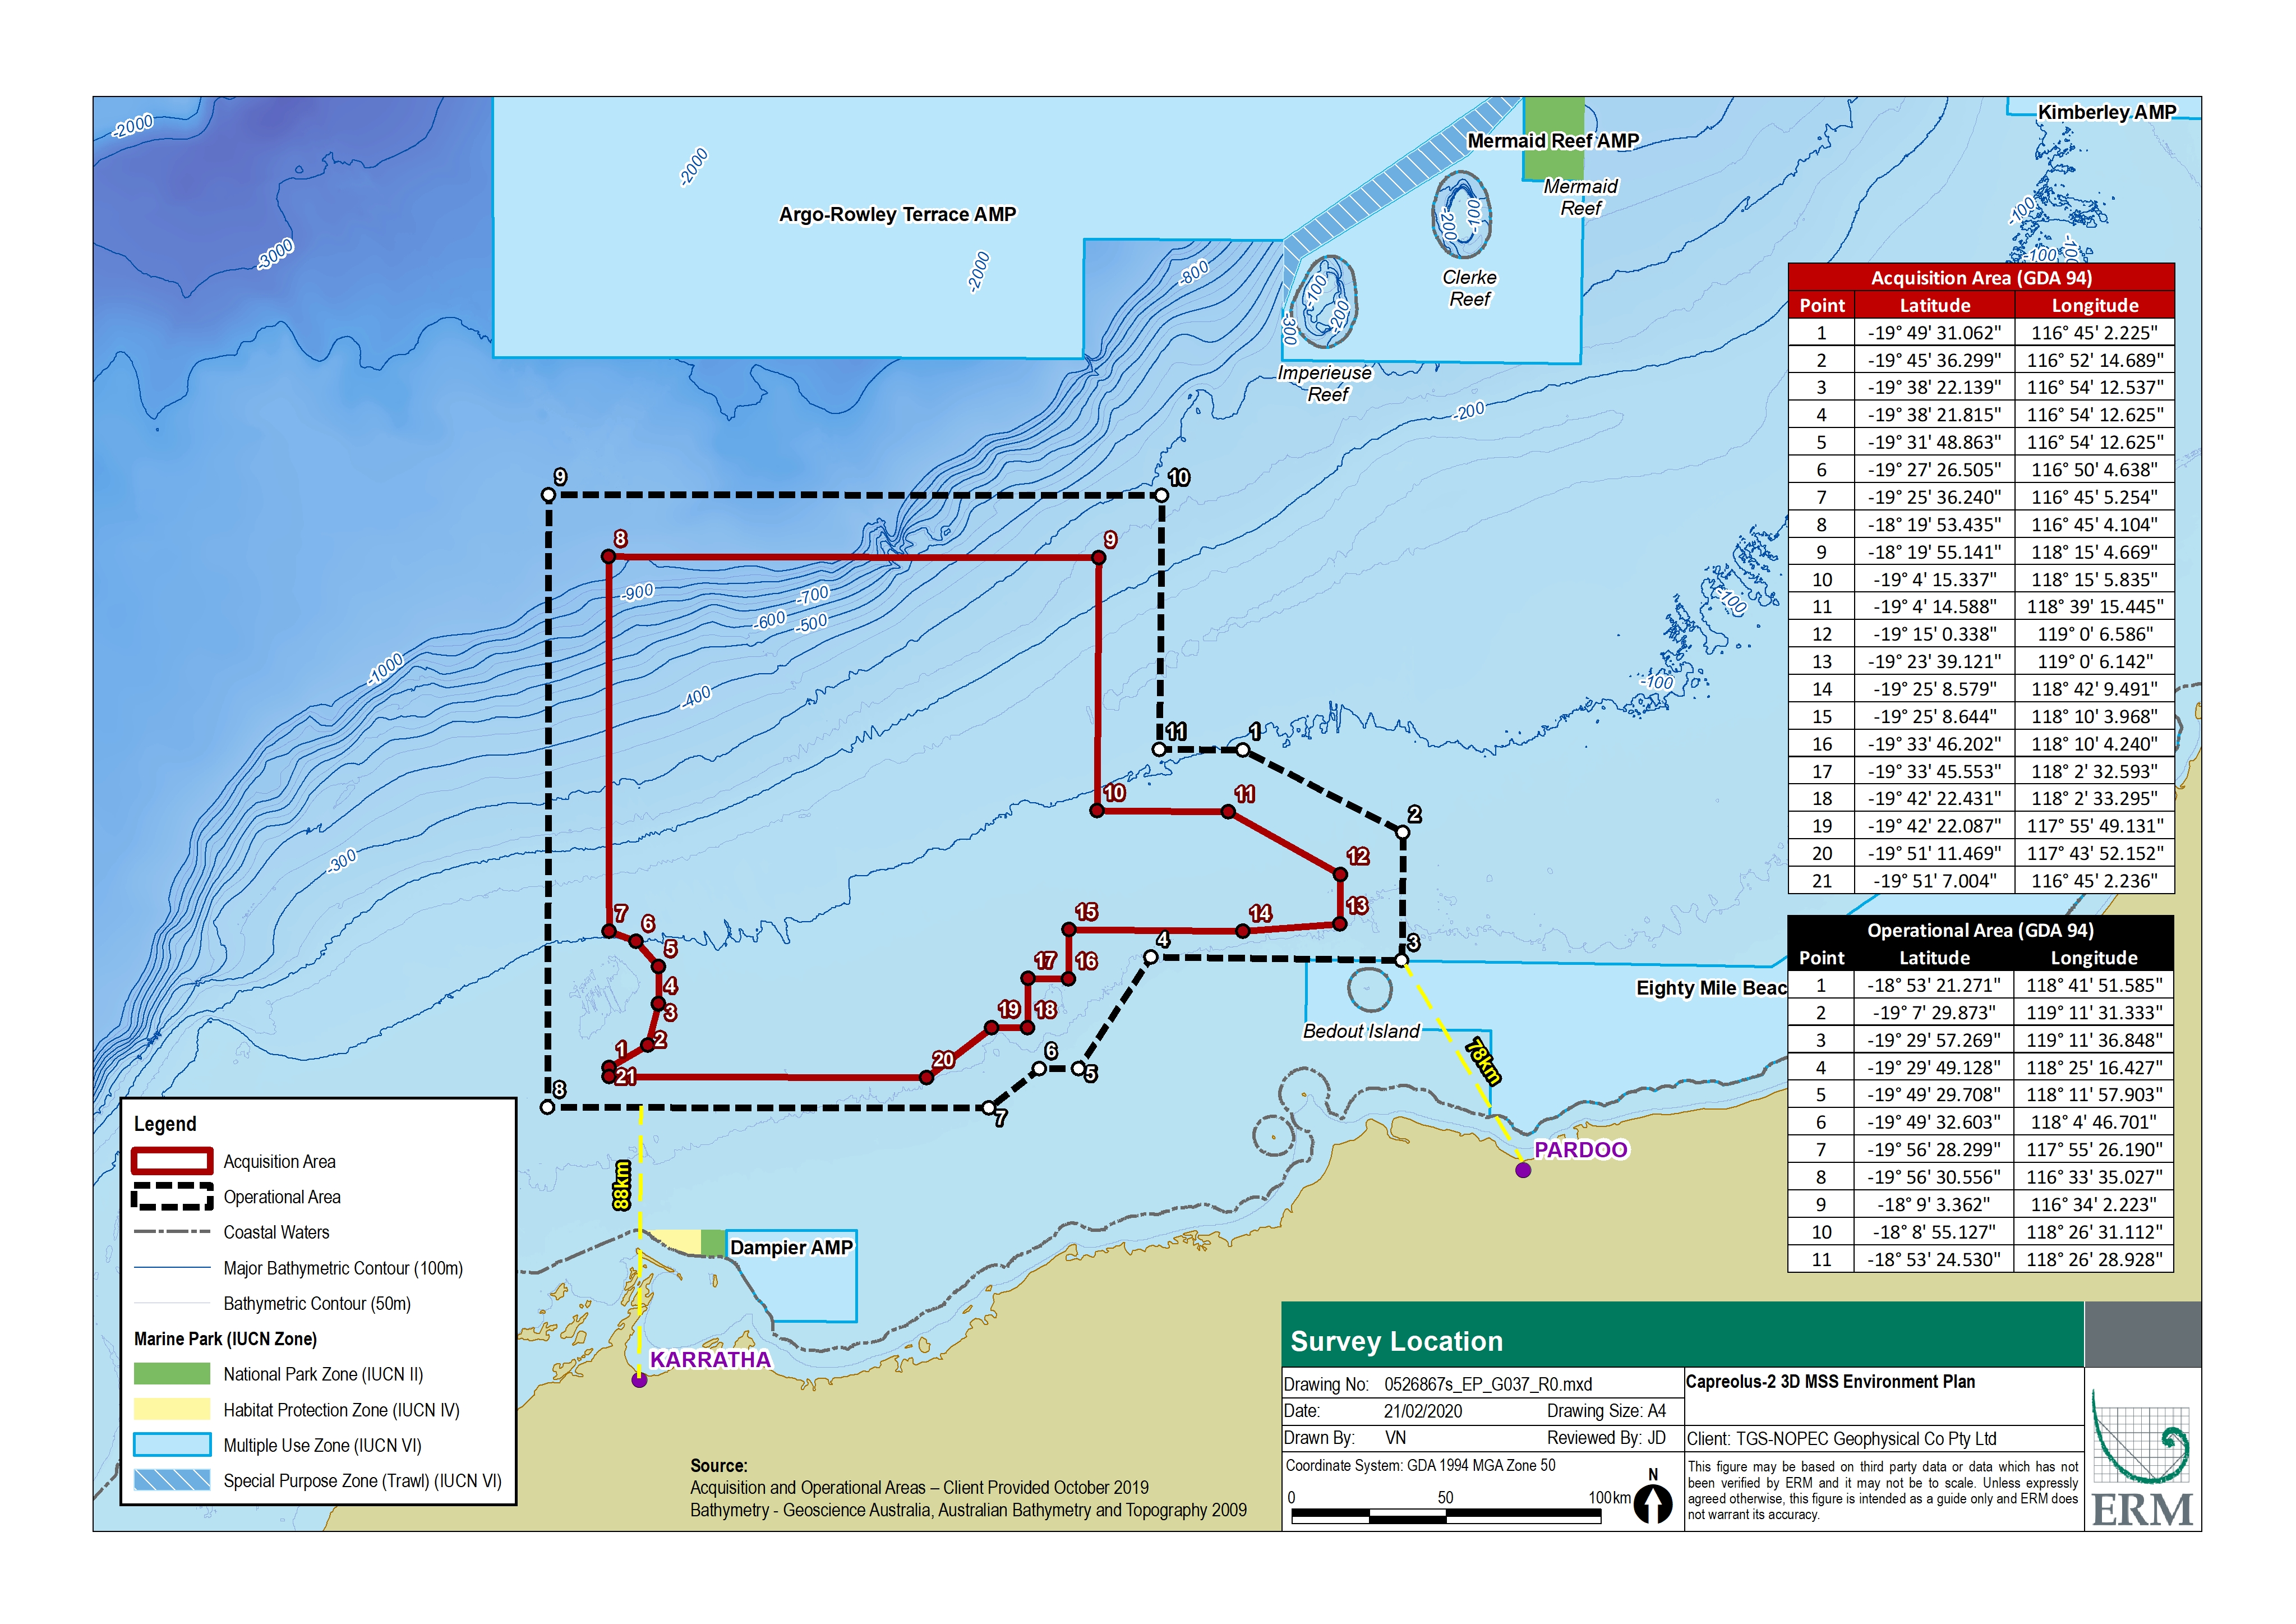 Location map - Activity: Capreolus-2 3D Marine Seismic Survey 2020 - 2023 (refer to description)